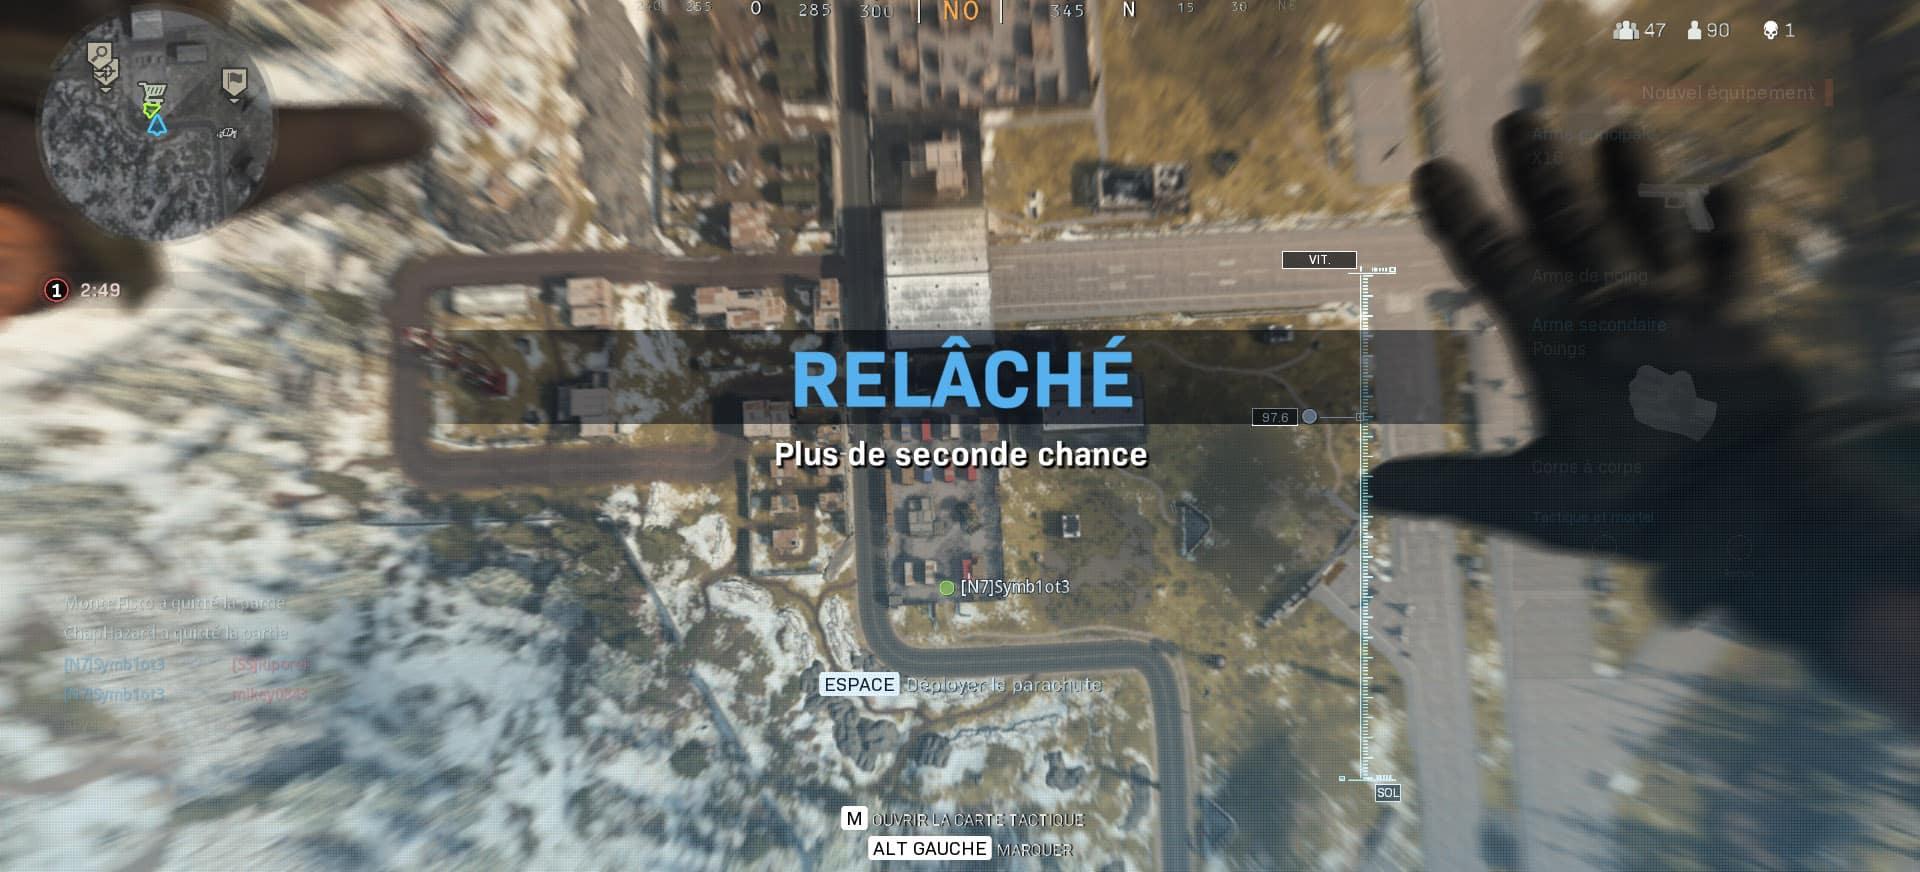 warzone-goulag-conseils-tips-gagner-comment-gratuit-cod-call-of-duty-modern-warfare-trailer-battle-royale-vignette